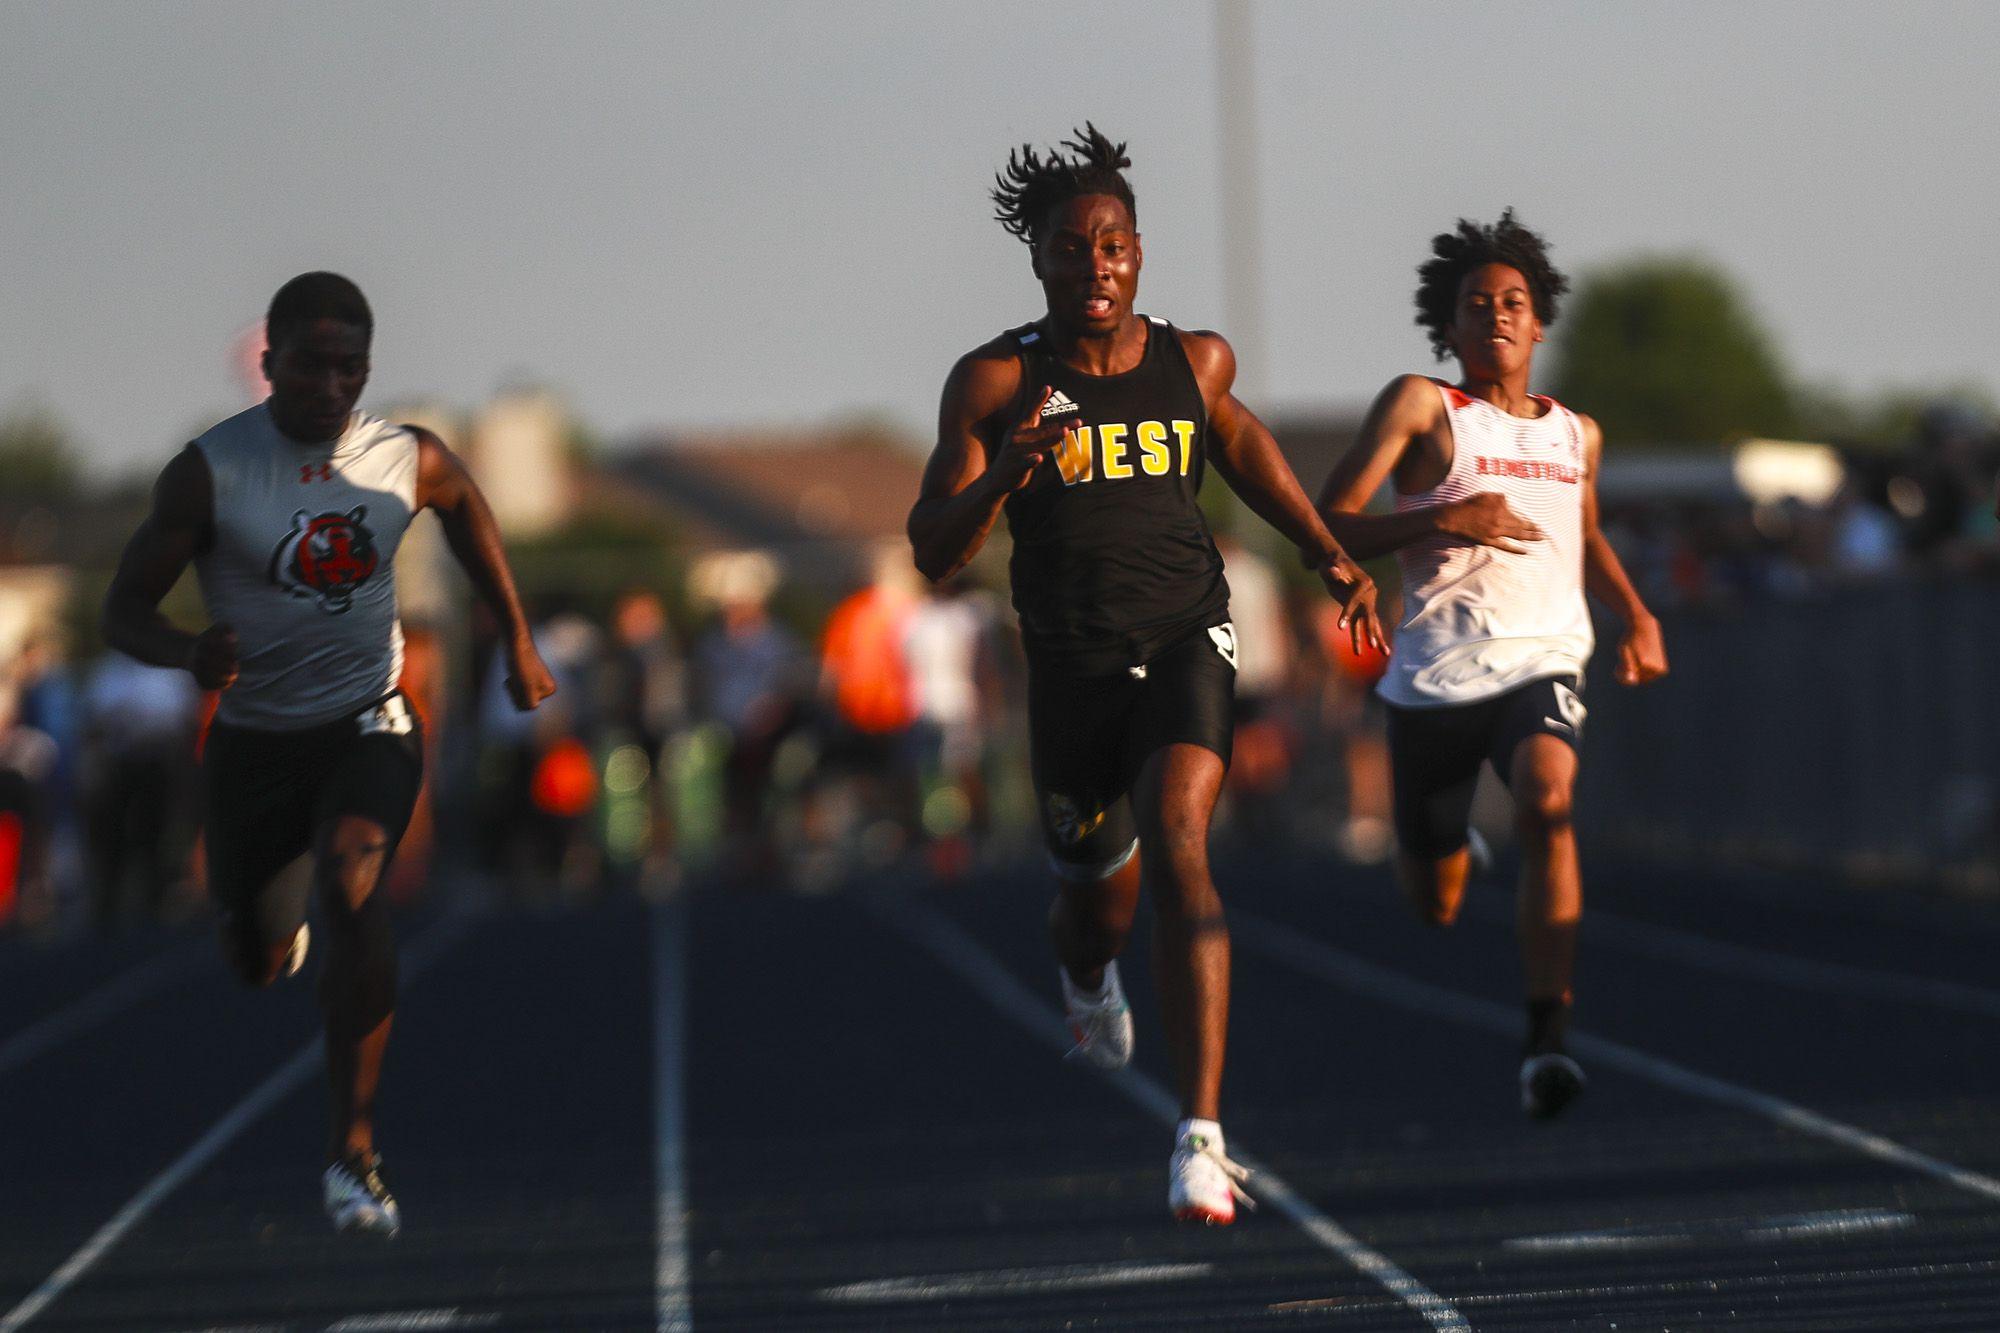 Joliet West sprinter Robert Satterwhite powers through the finish on Saturday, June 5, 2021, at Plainfield South High School in Plainfield, Ill.